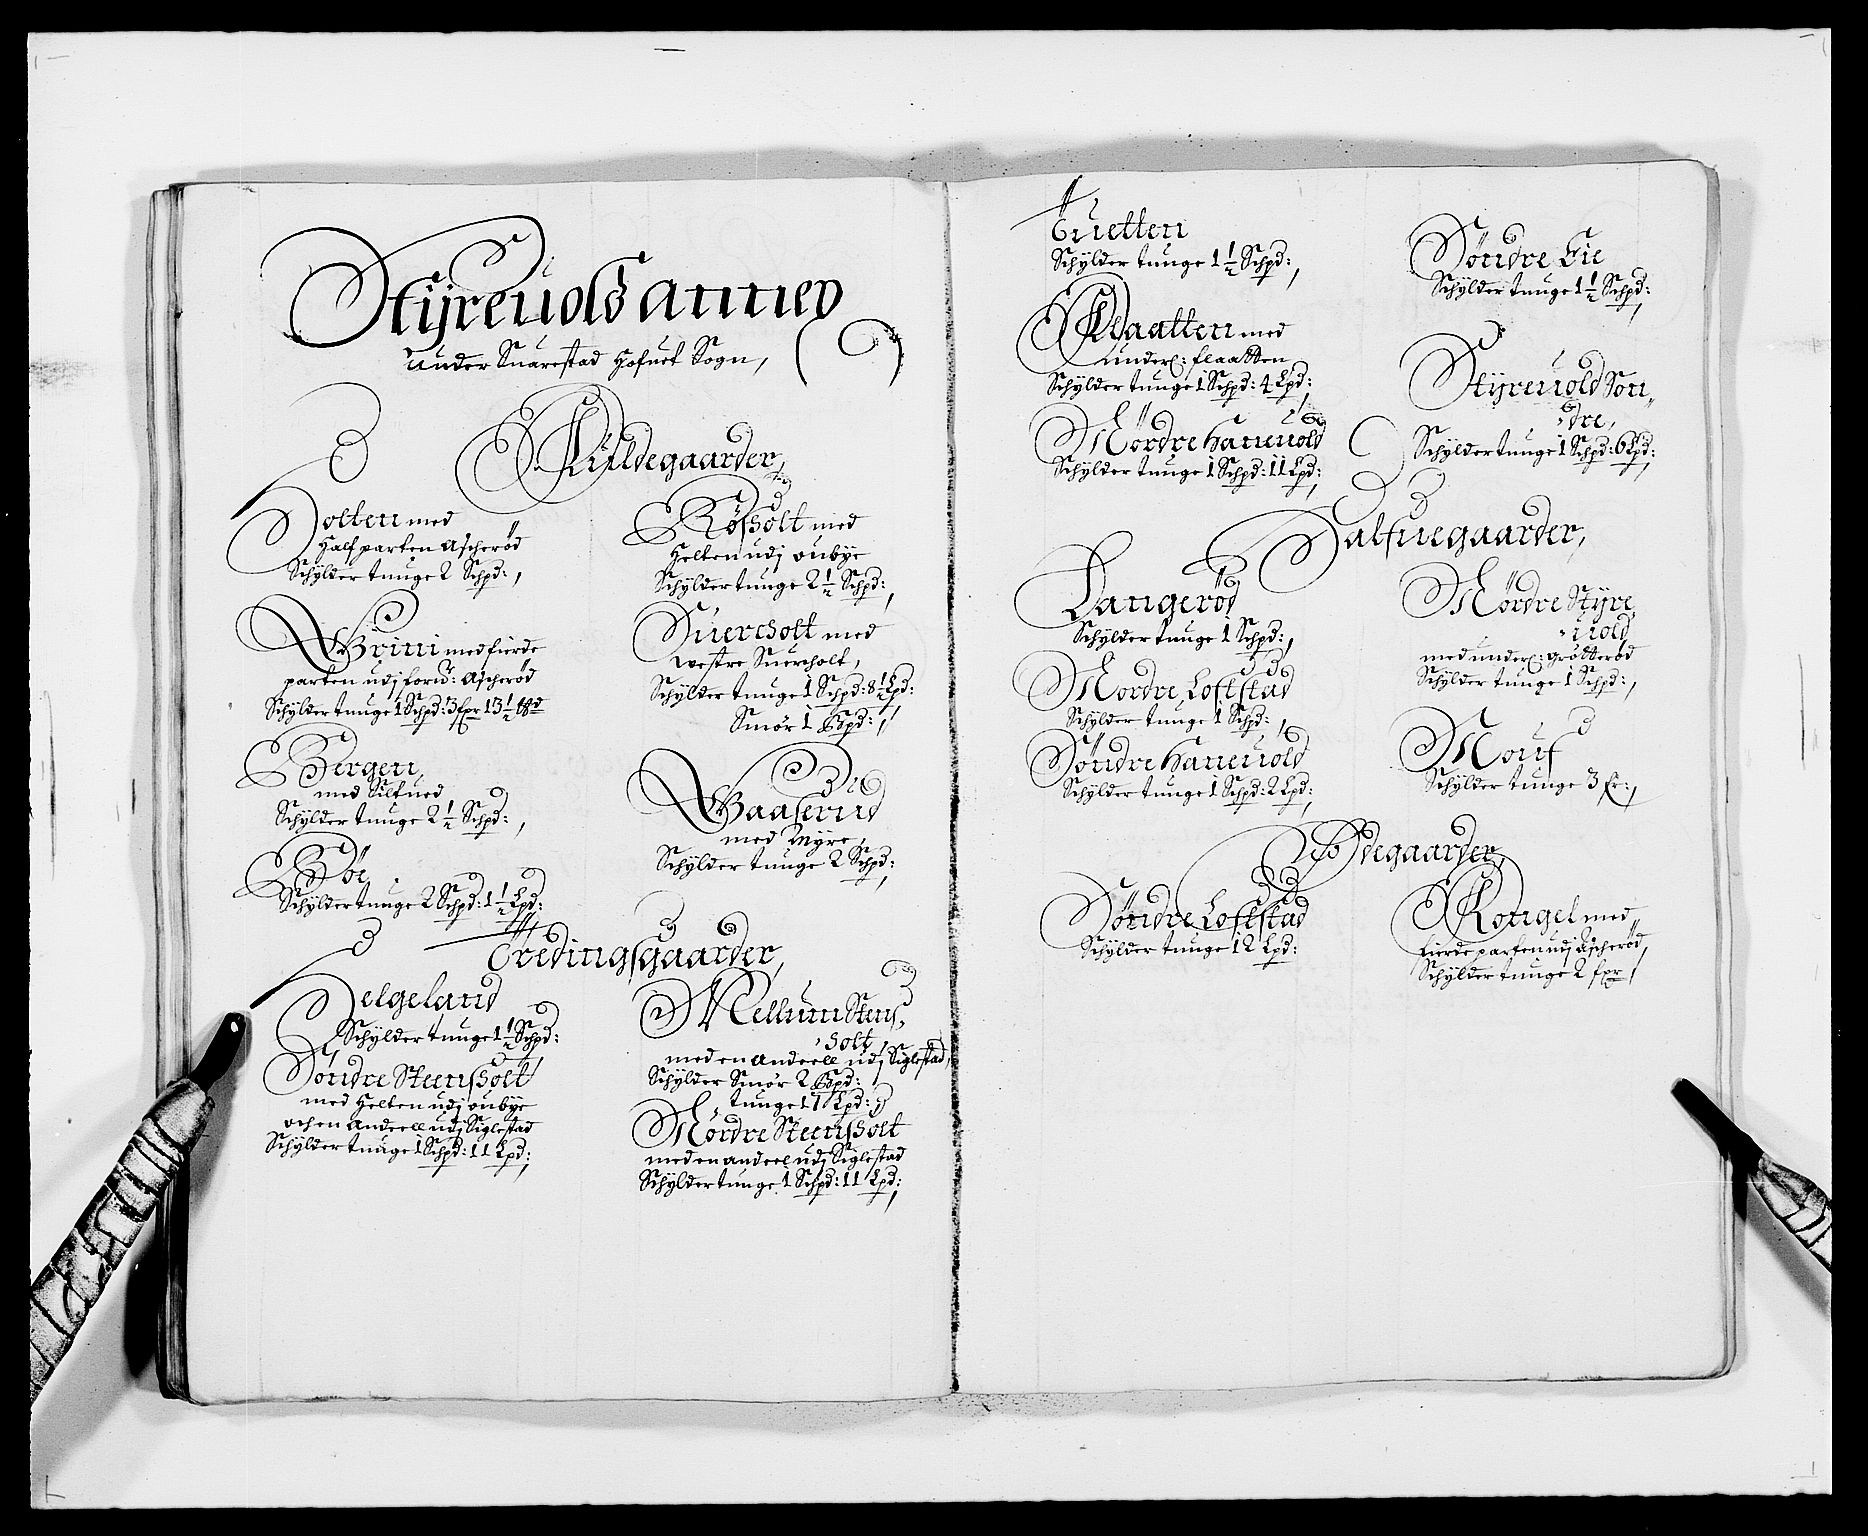 RA, Rentekammeret inntil 1814, Reviderte regnskaper, Fogderegnskap, R32/L1857: Fogderegnskap Jarlsberg grevskap, 1686-1690, s. 80